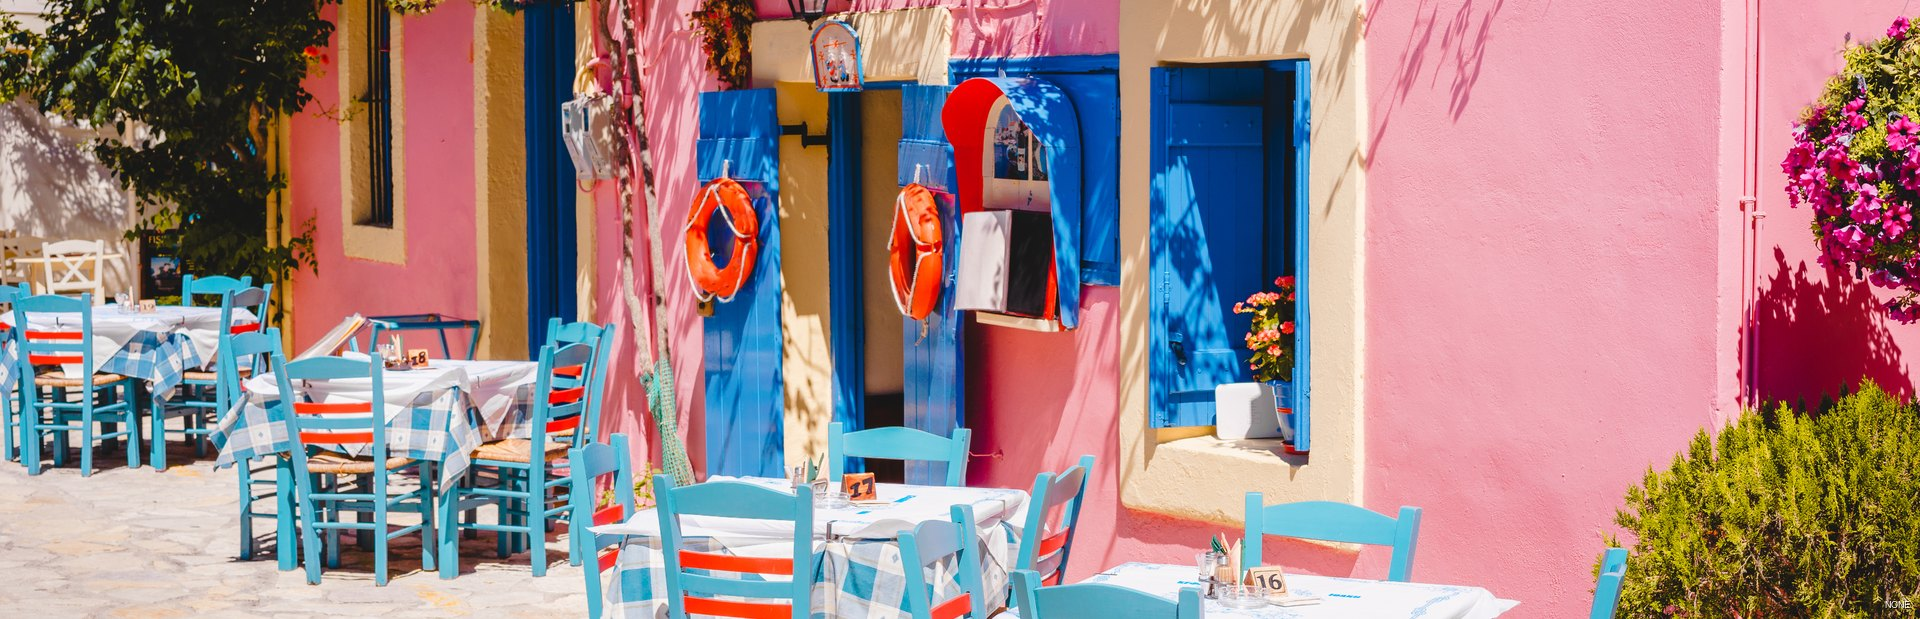 Corfu inspiration and tips